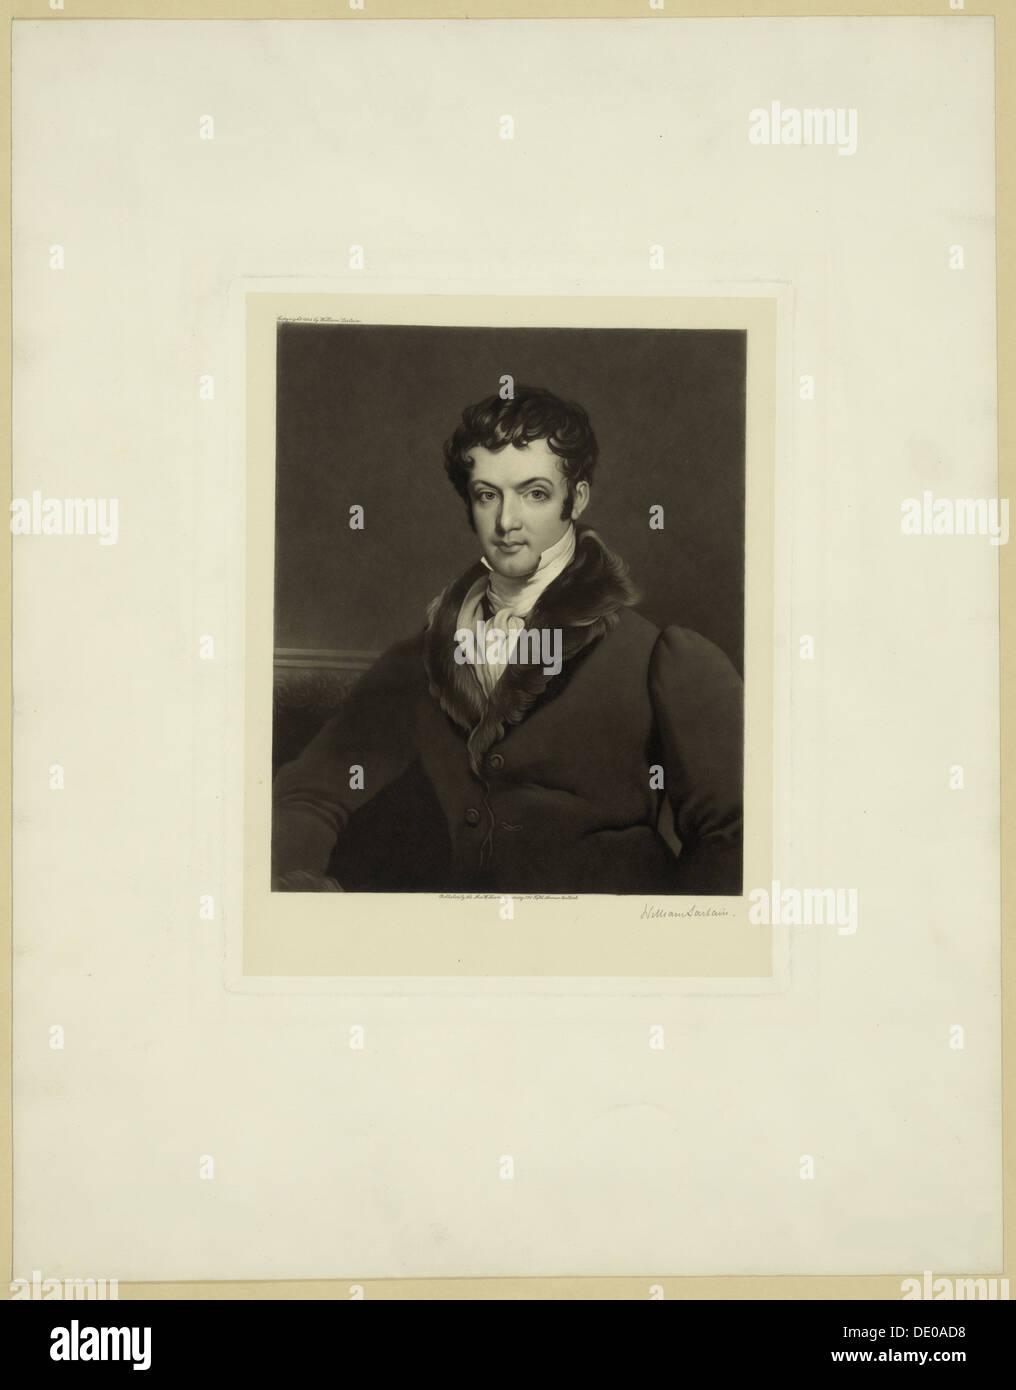 Portrait of Washington Irving (1783–1859). Artist: Sartain, William (1843-1924) - Stock Image